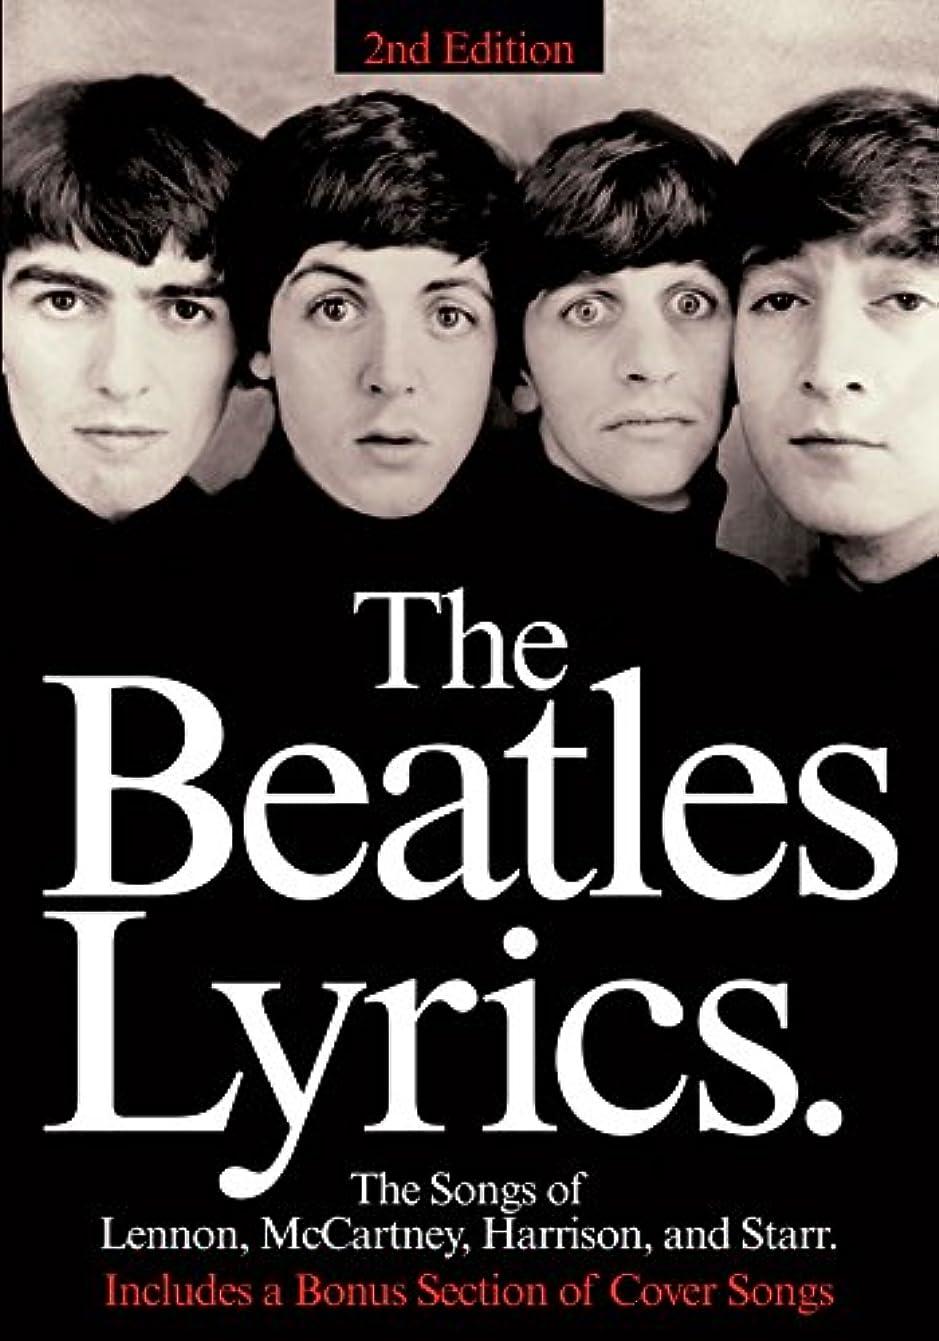 The Beatles Lyrics: The Songs of Lennon, McCartney, Harrison and Starr (English Edition)